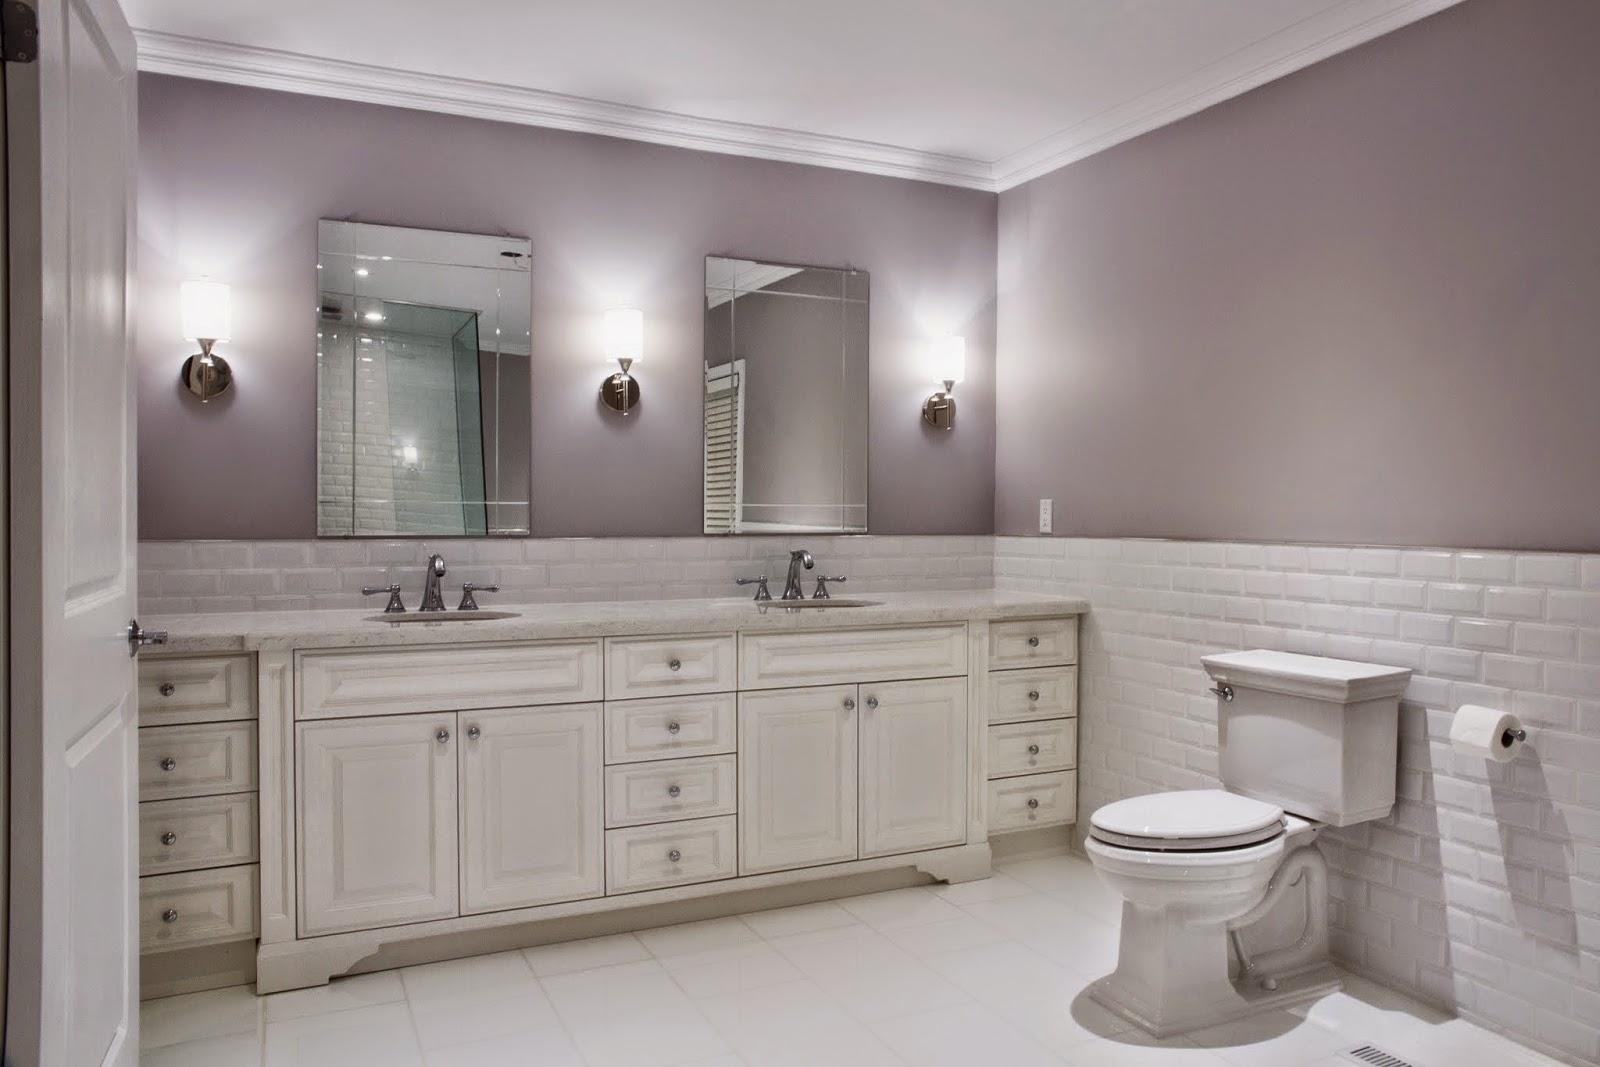 Rooms With Benjamin Moore Cement Gray Paint : Mi painting and wallpaper benjamin moore